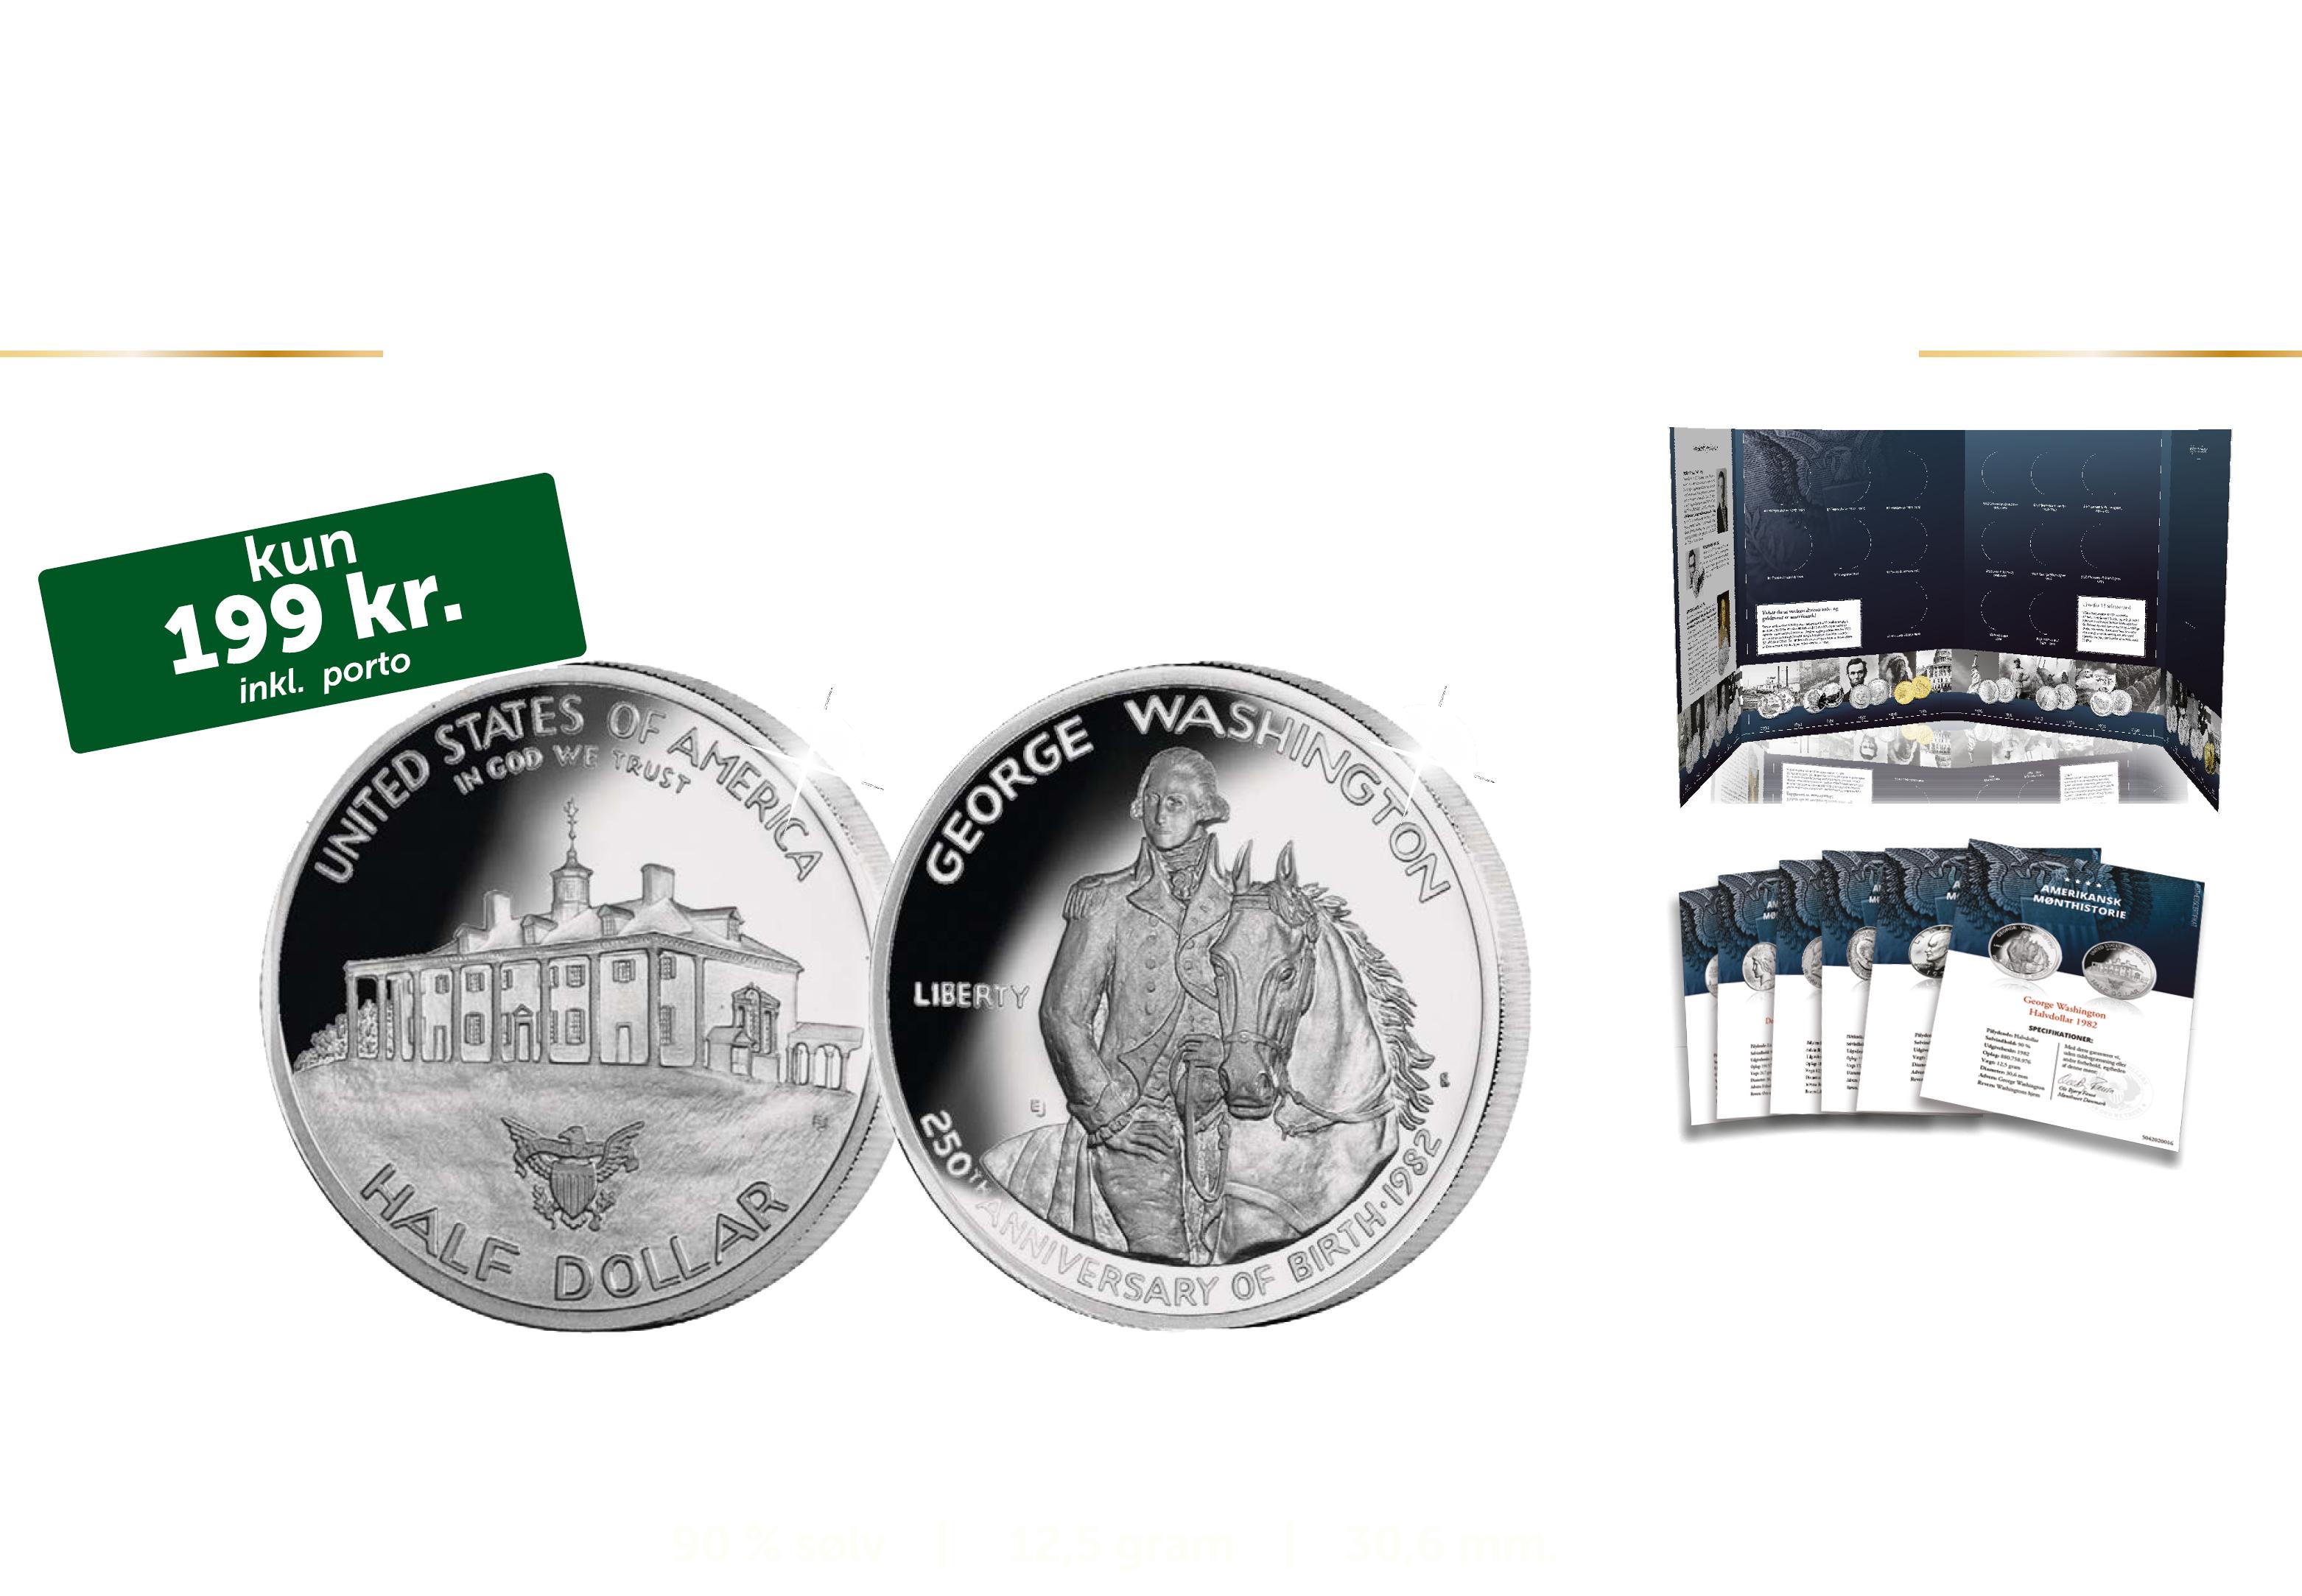 Amerikanske sølvdollars - Løbende samling. Ingen binding. Du kan til enhver tid opsige din samling